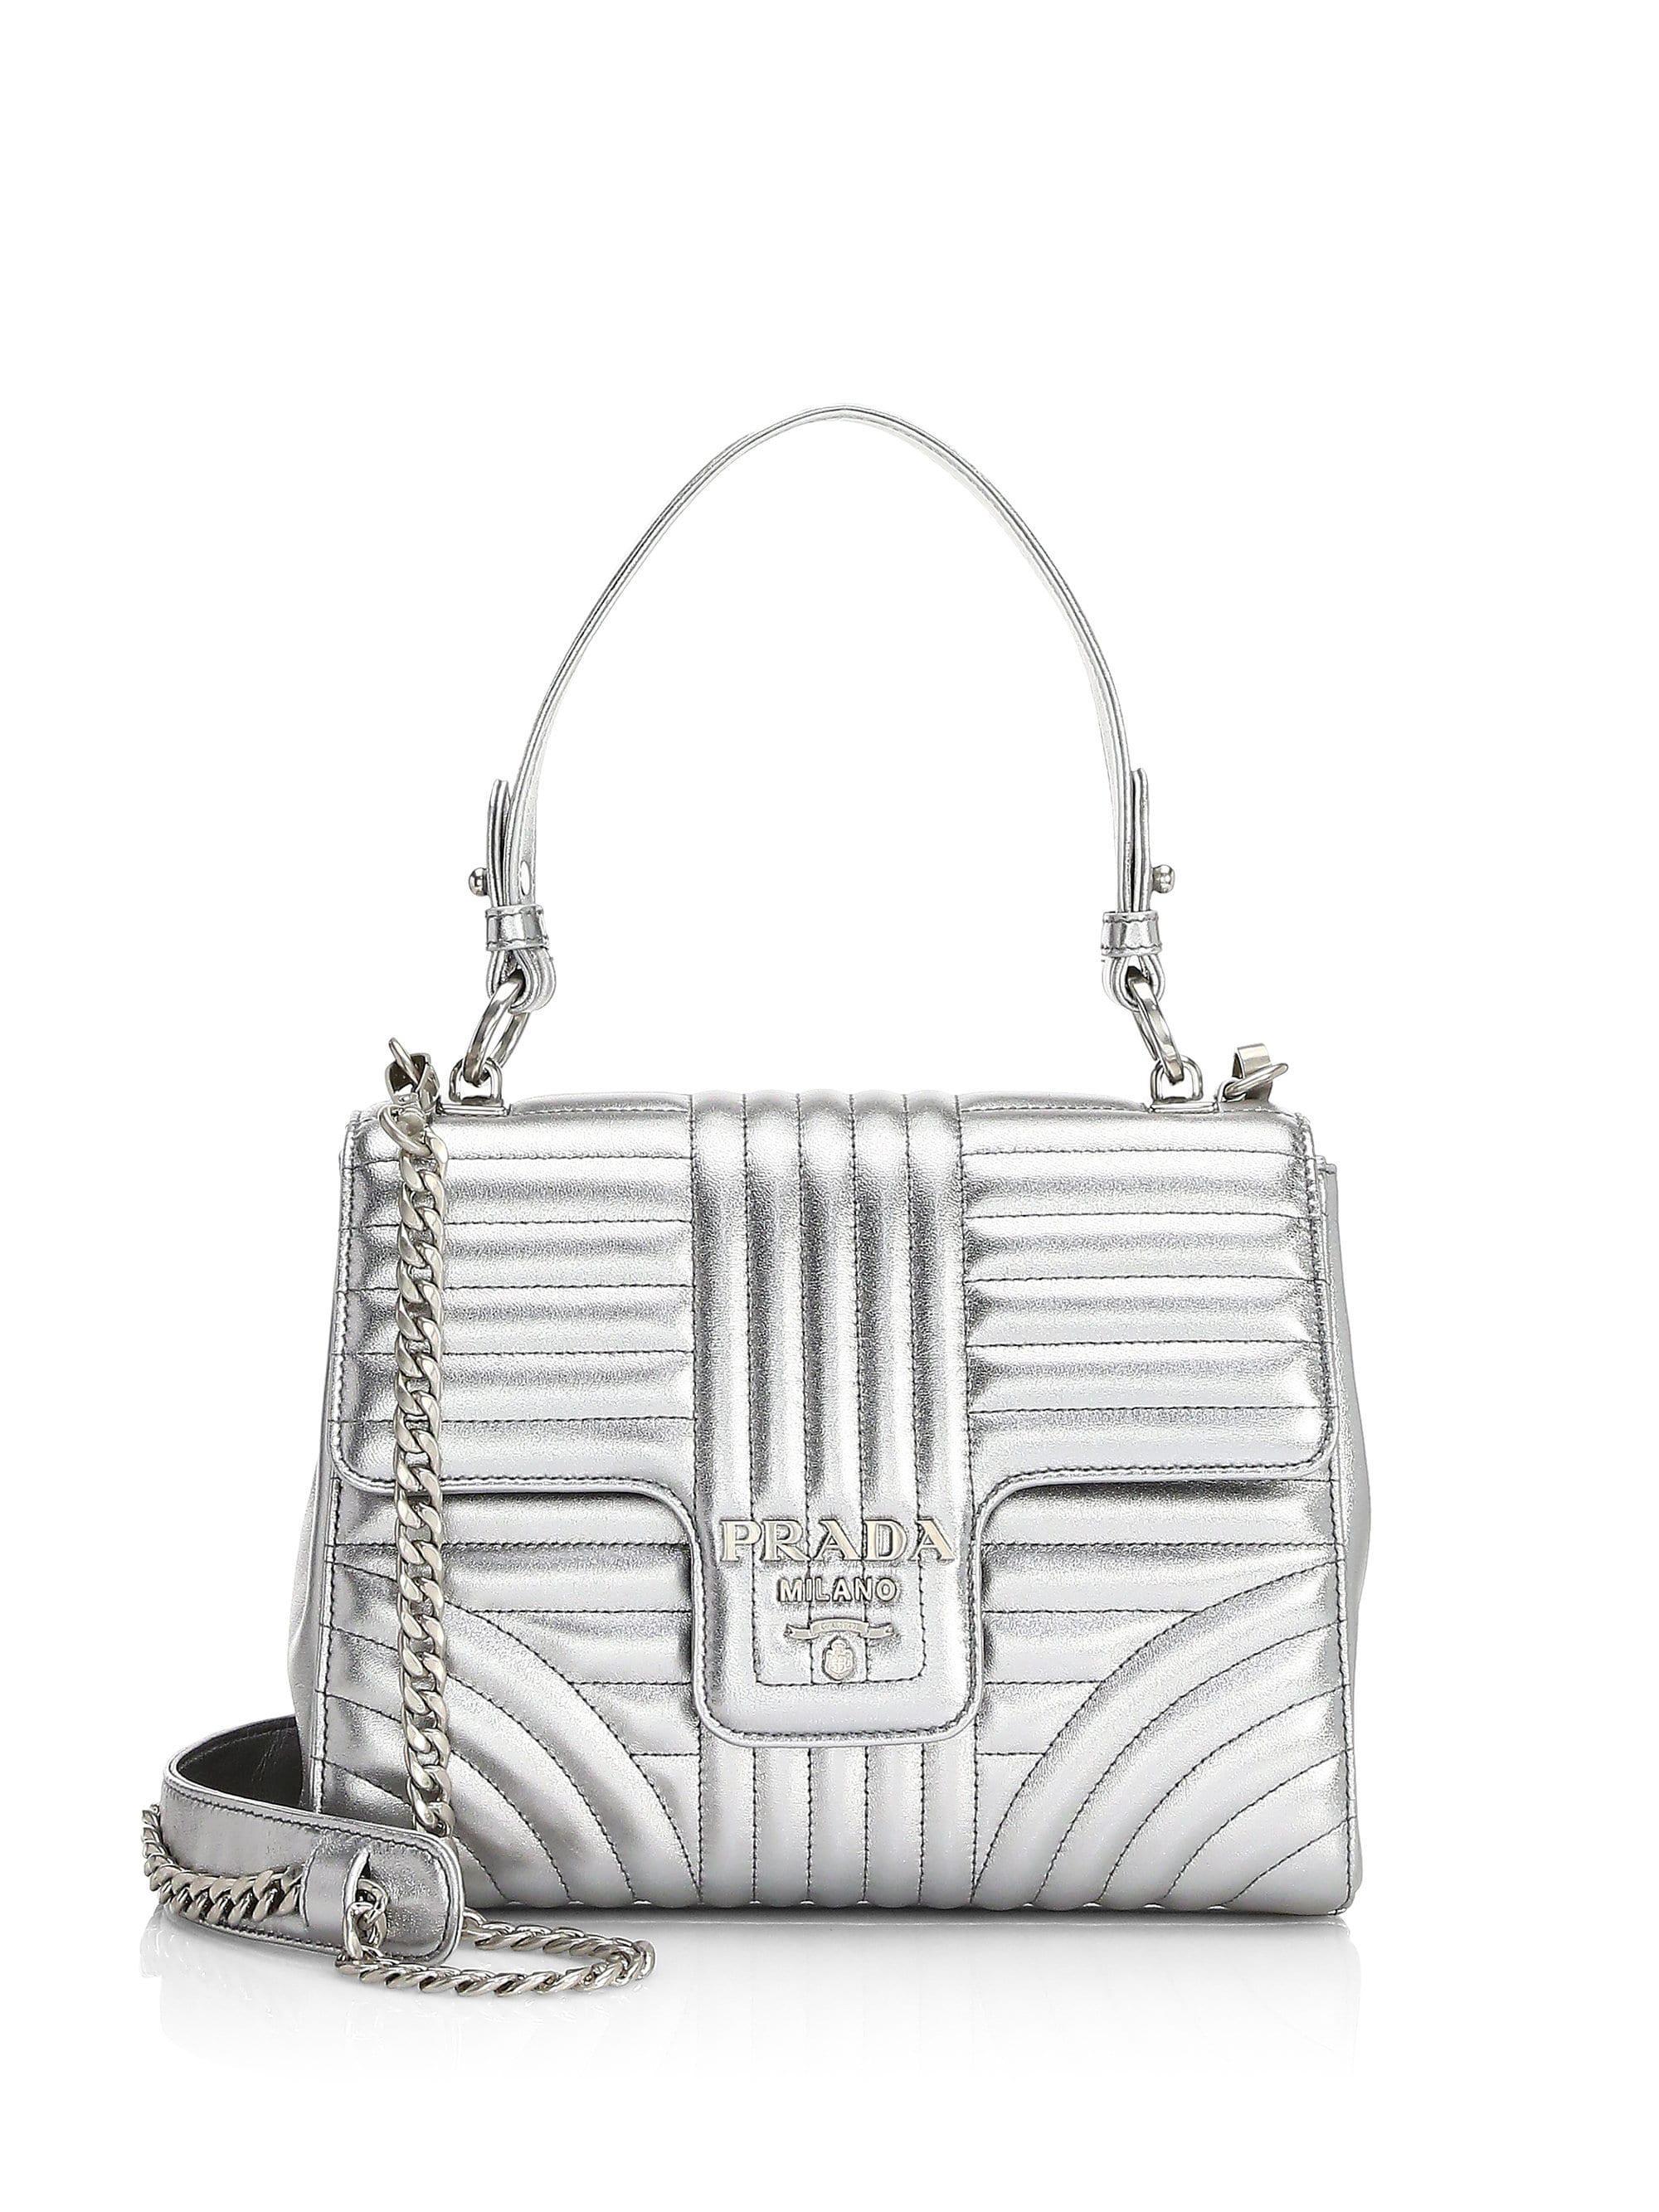 522cd916cdb4 Prada Diagramme Leather Convertible Shoulder Bag - Lyst